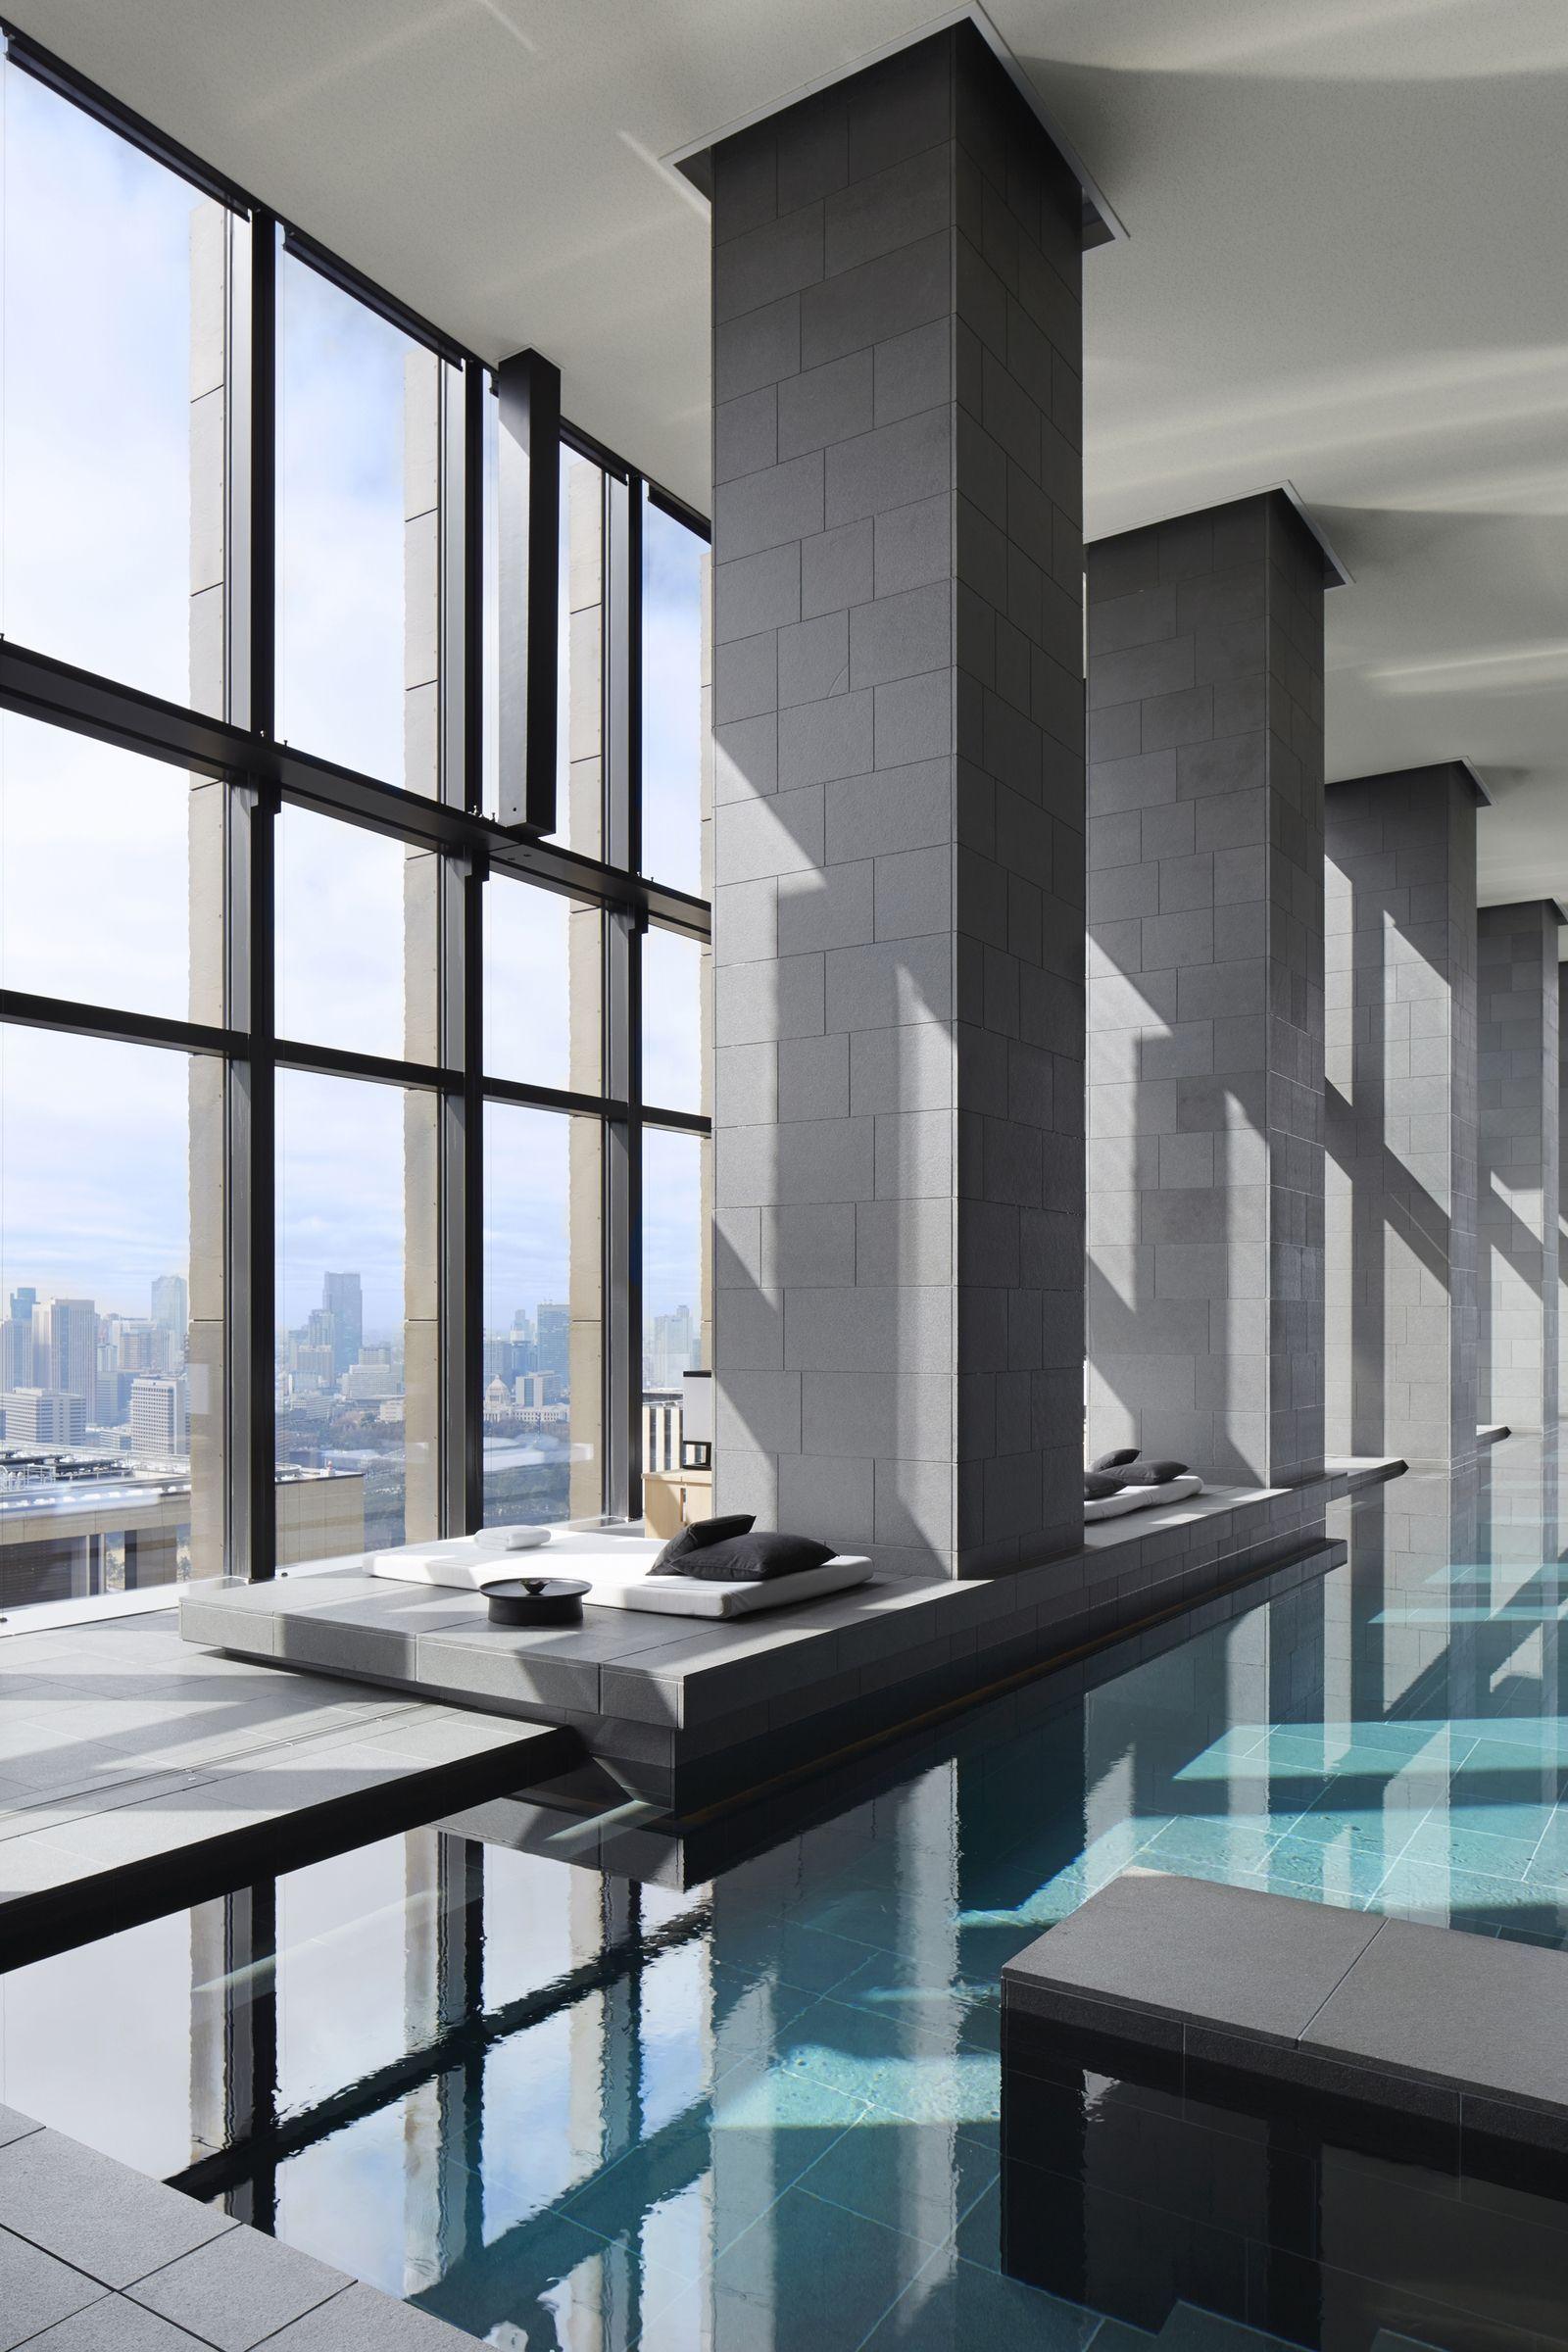 Four seasons shangai chine piscine piscine intérieure panorama